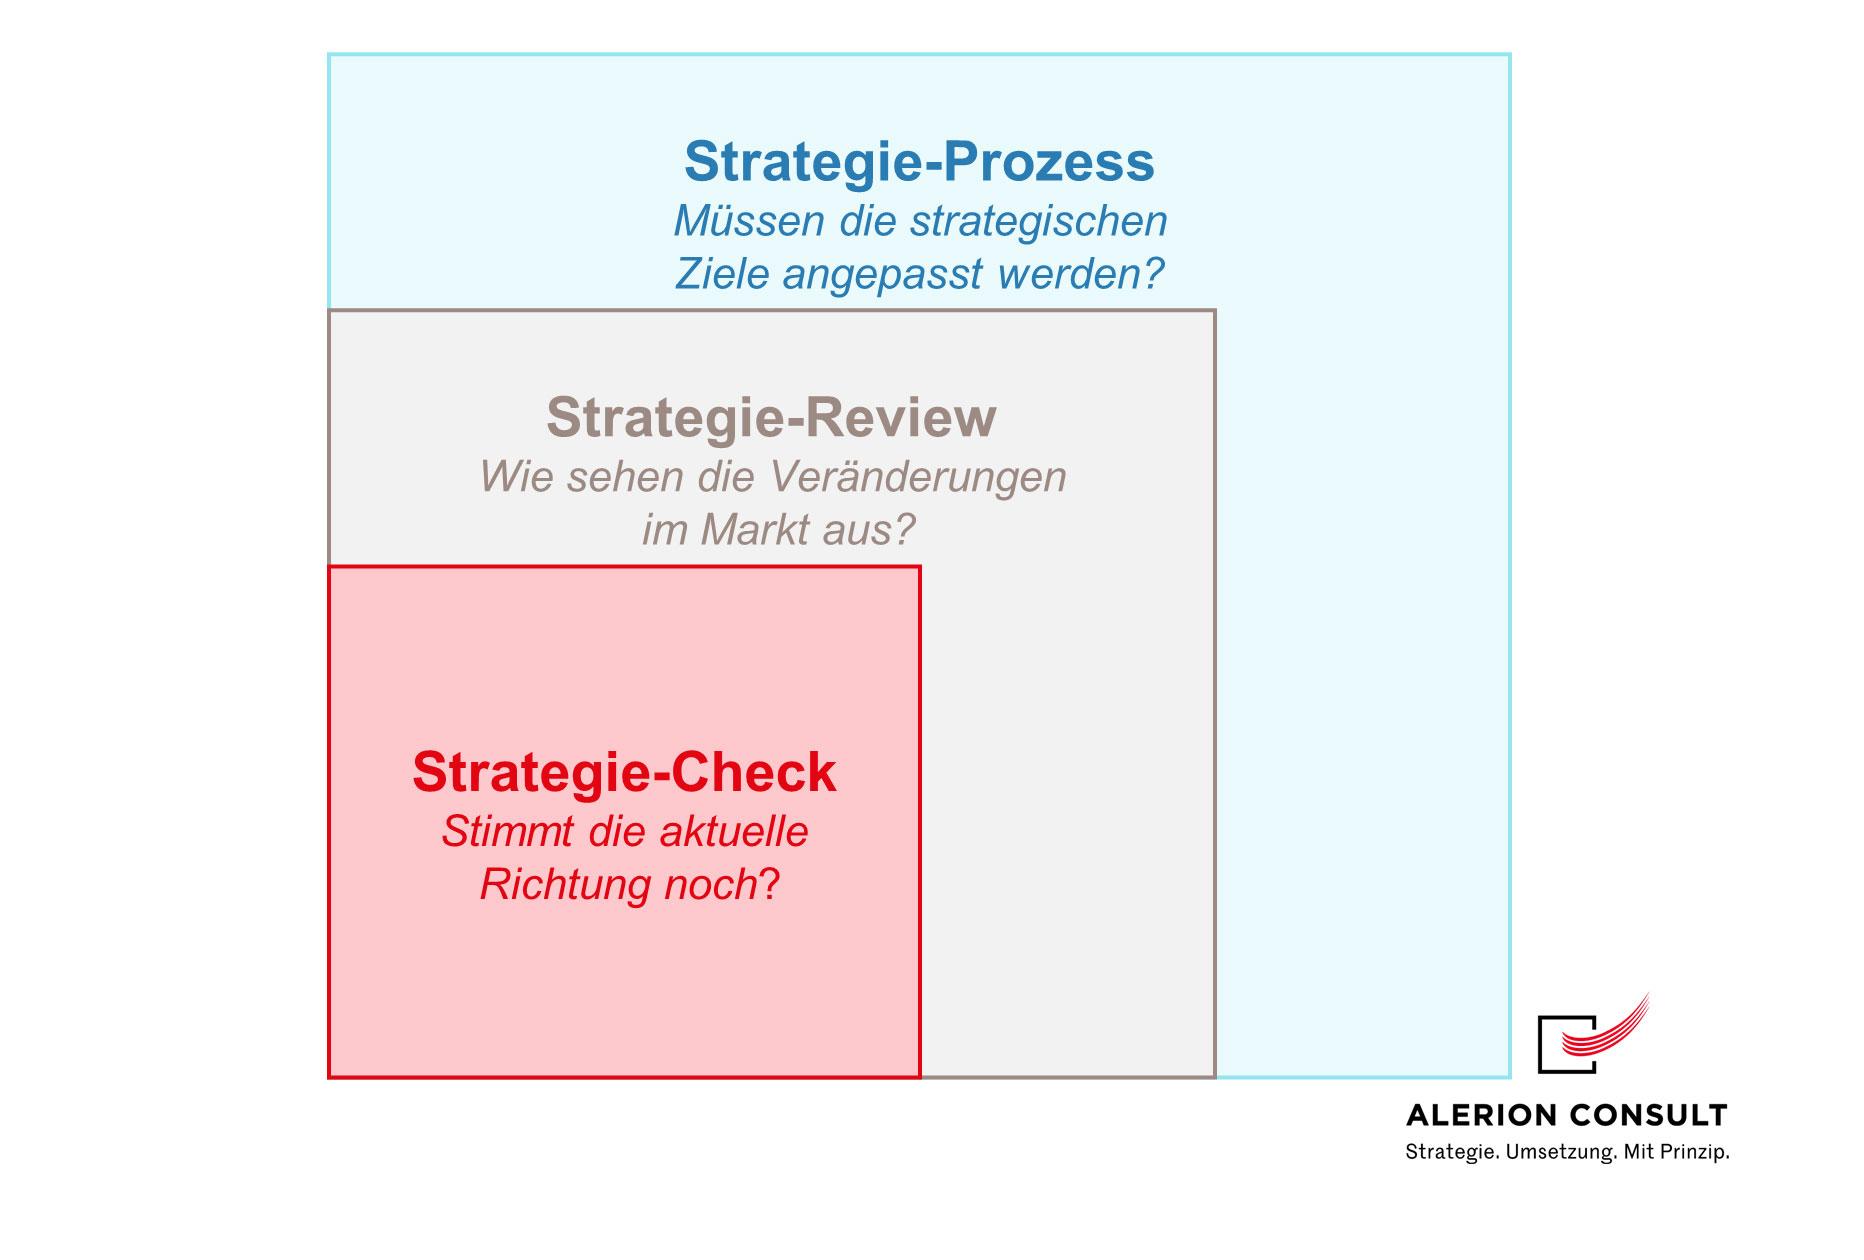 Strategie-Prozess modularer Aufbau